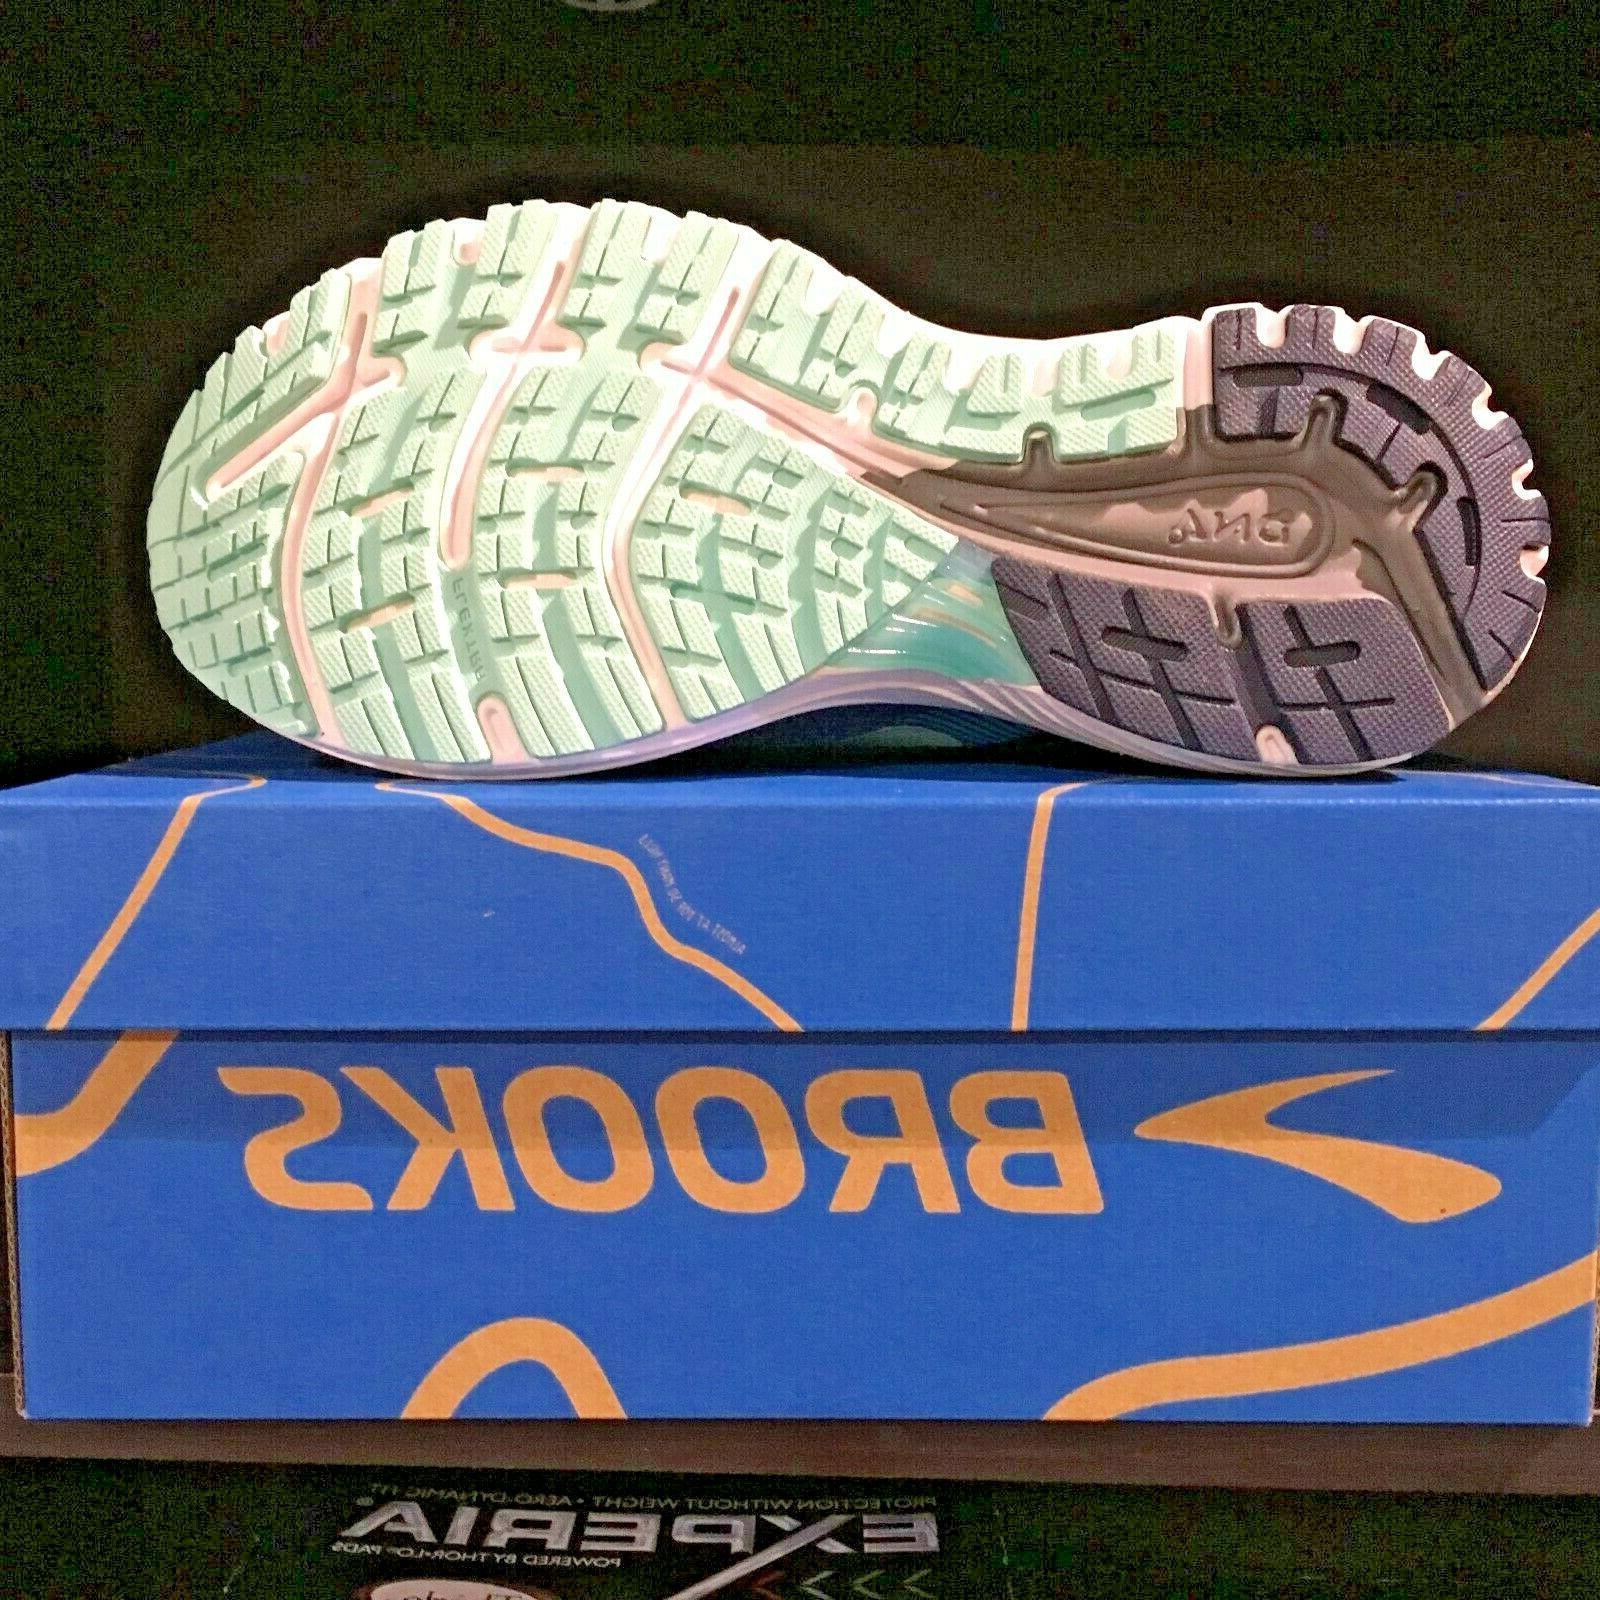 Brooks Womens 18 Running Shoes Teal Mint 495